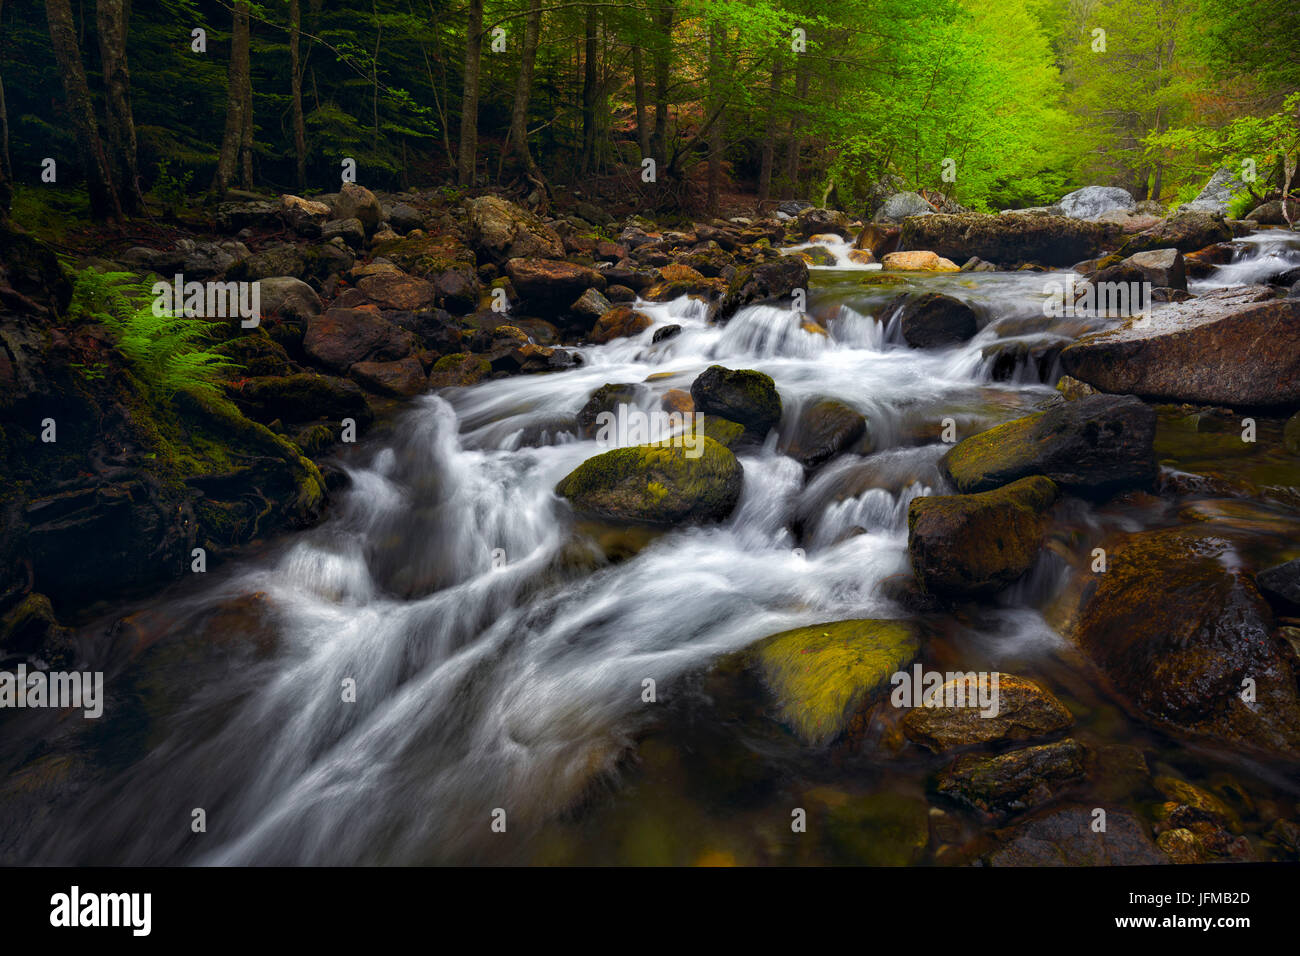 Aspromonte National Park, Gambarie, Reggio Calabria, Calabria, Italy, Menta waterscape - Stock Image